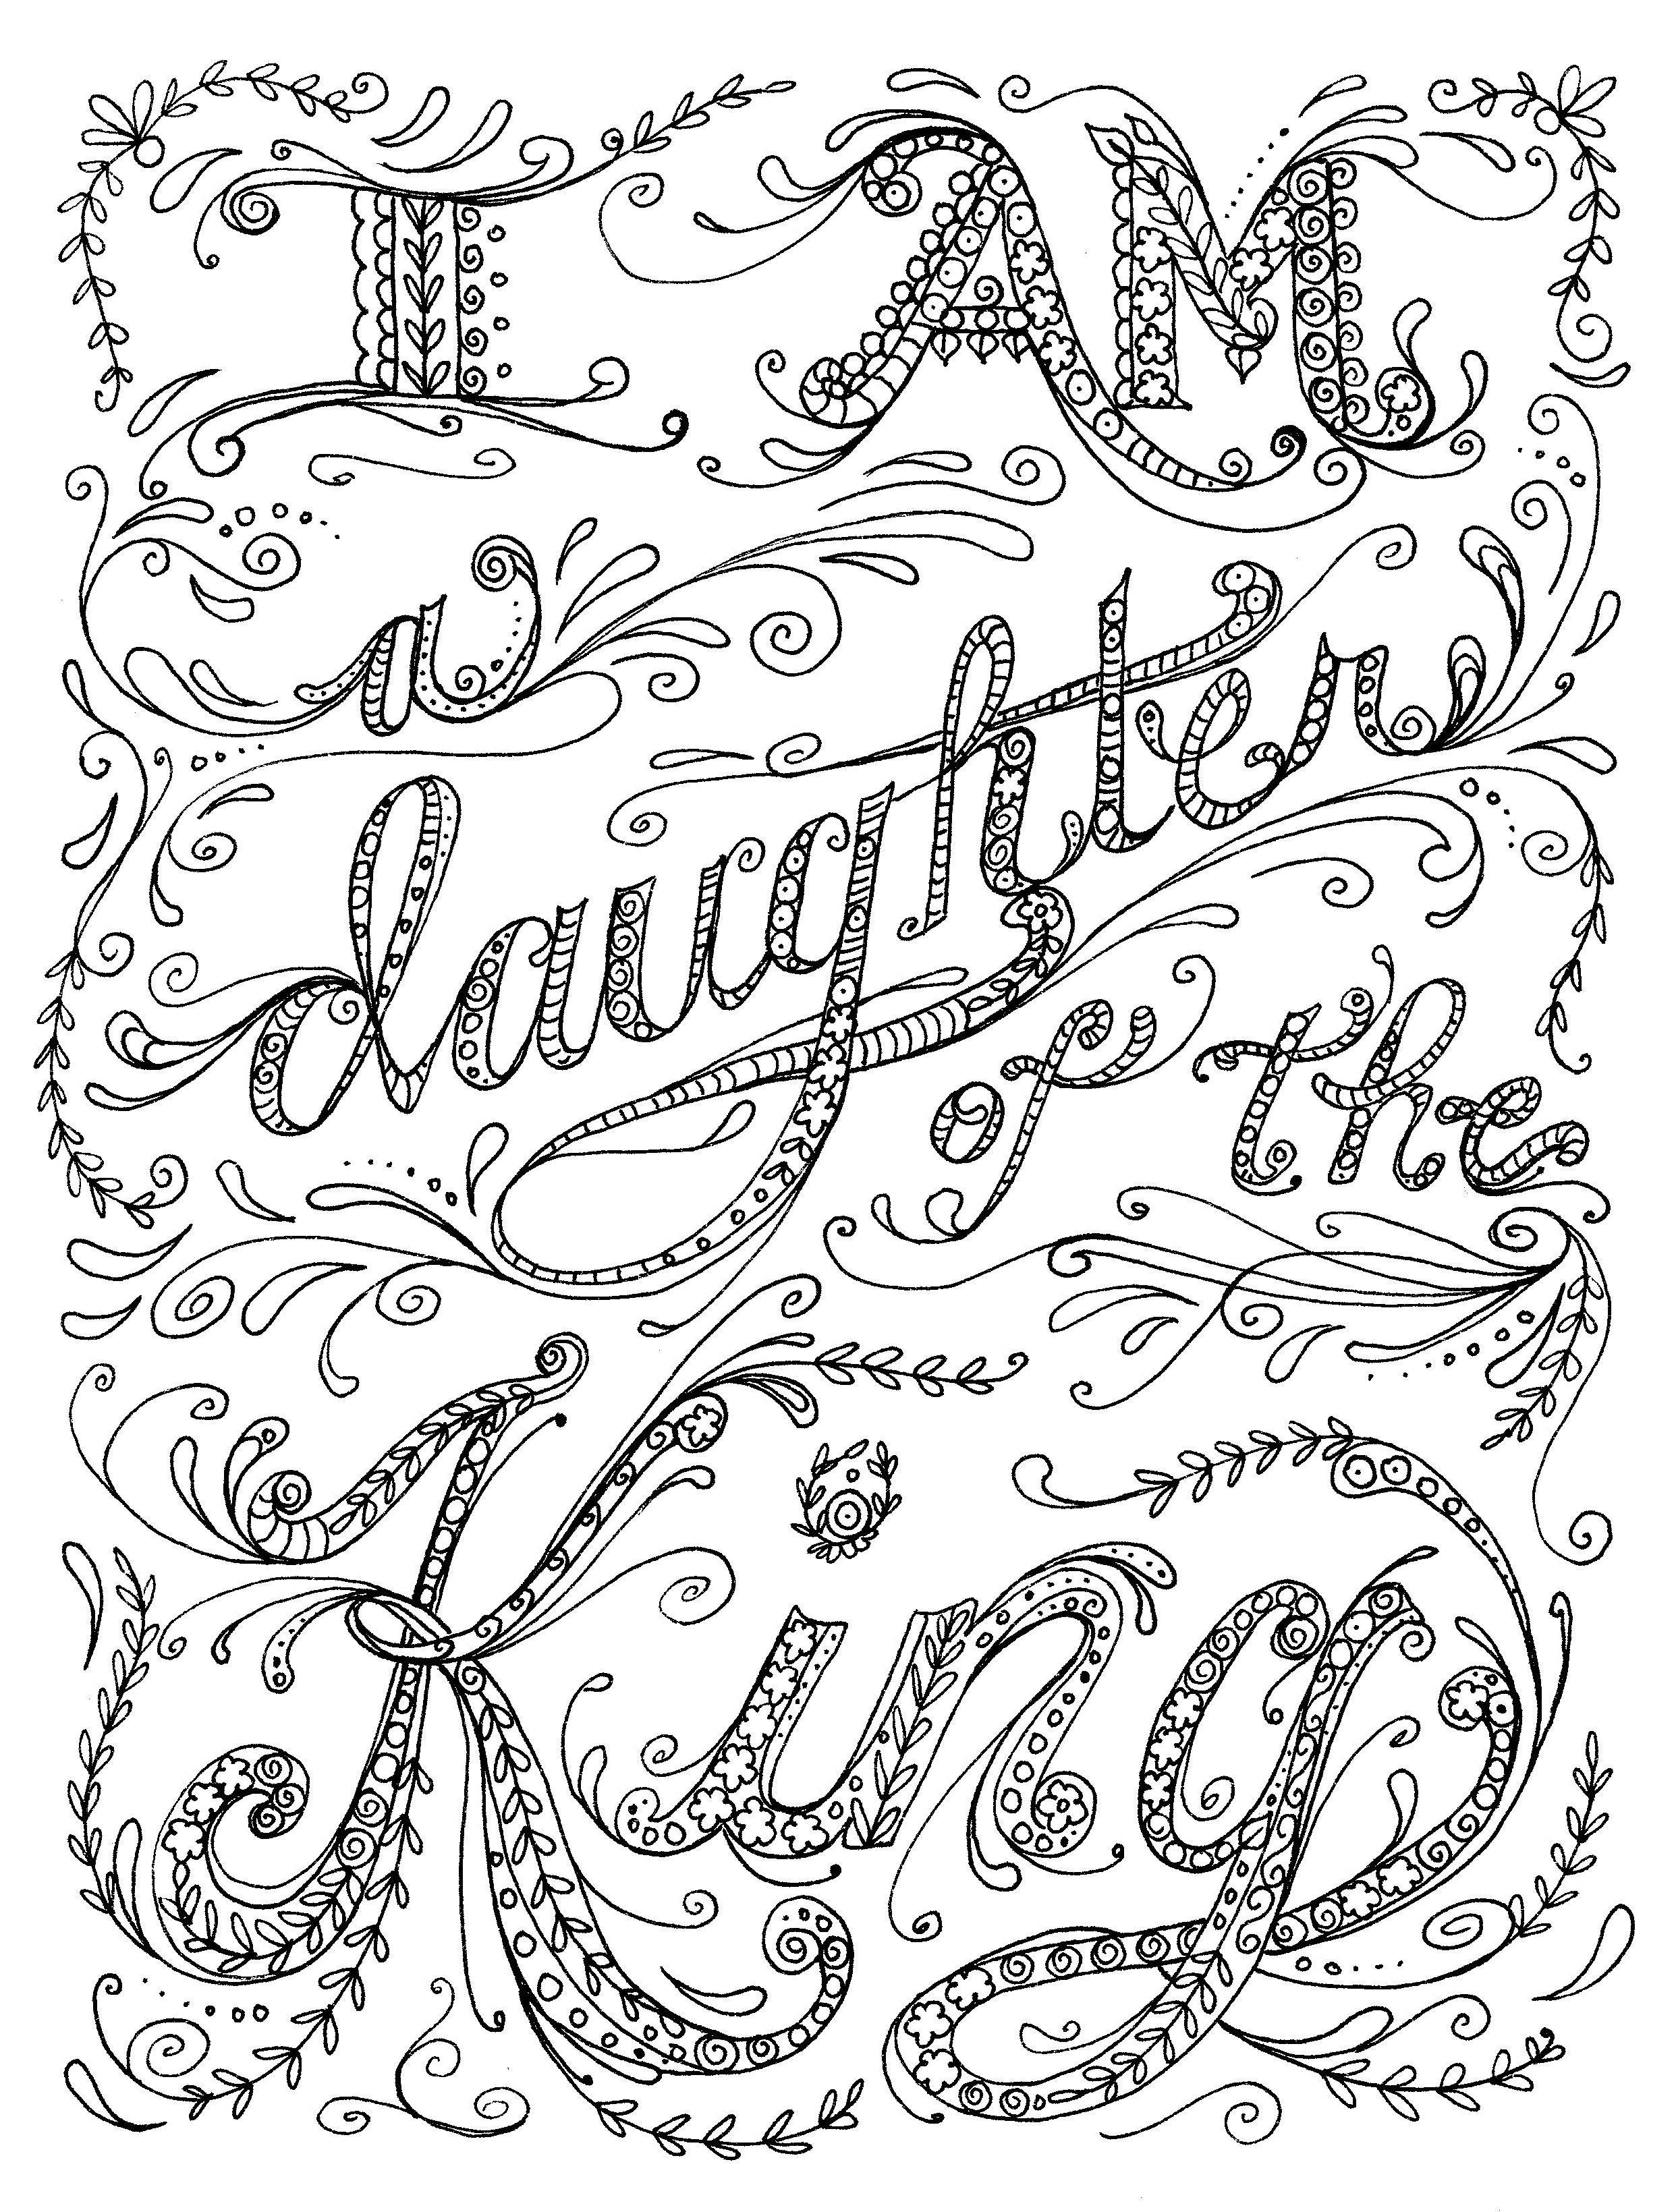 typography chubby mermaid on etsy chubby mermaid art on